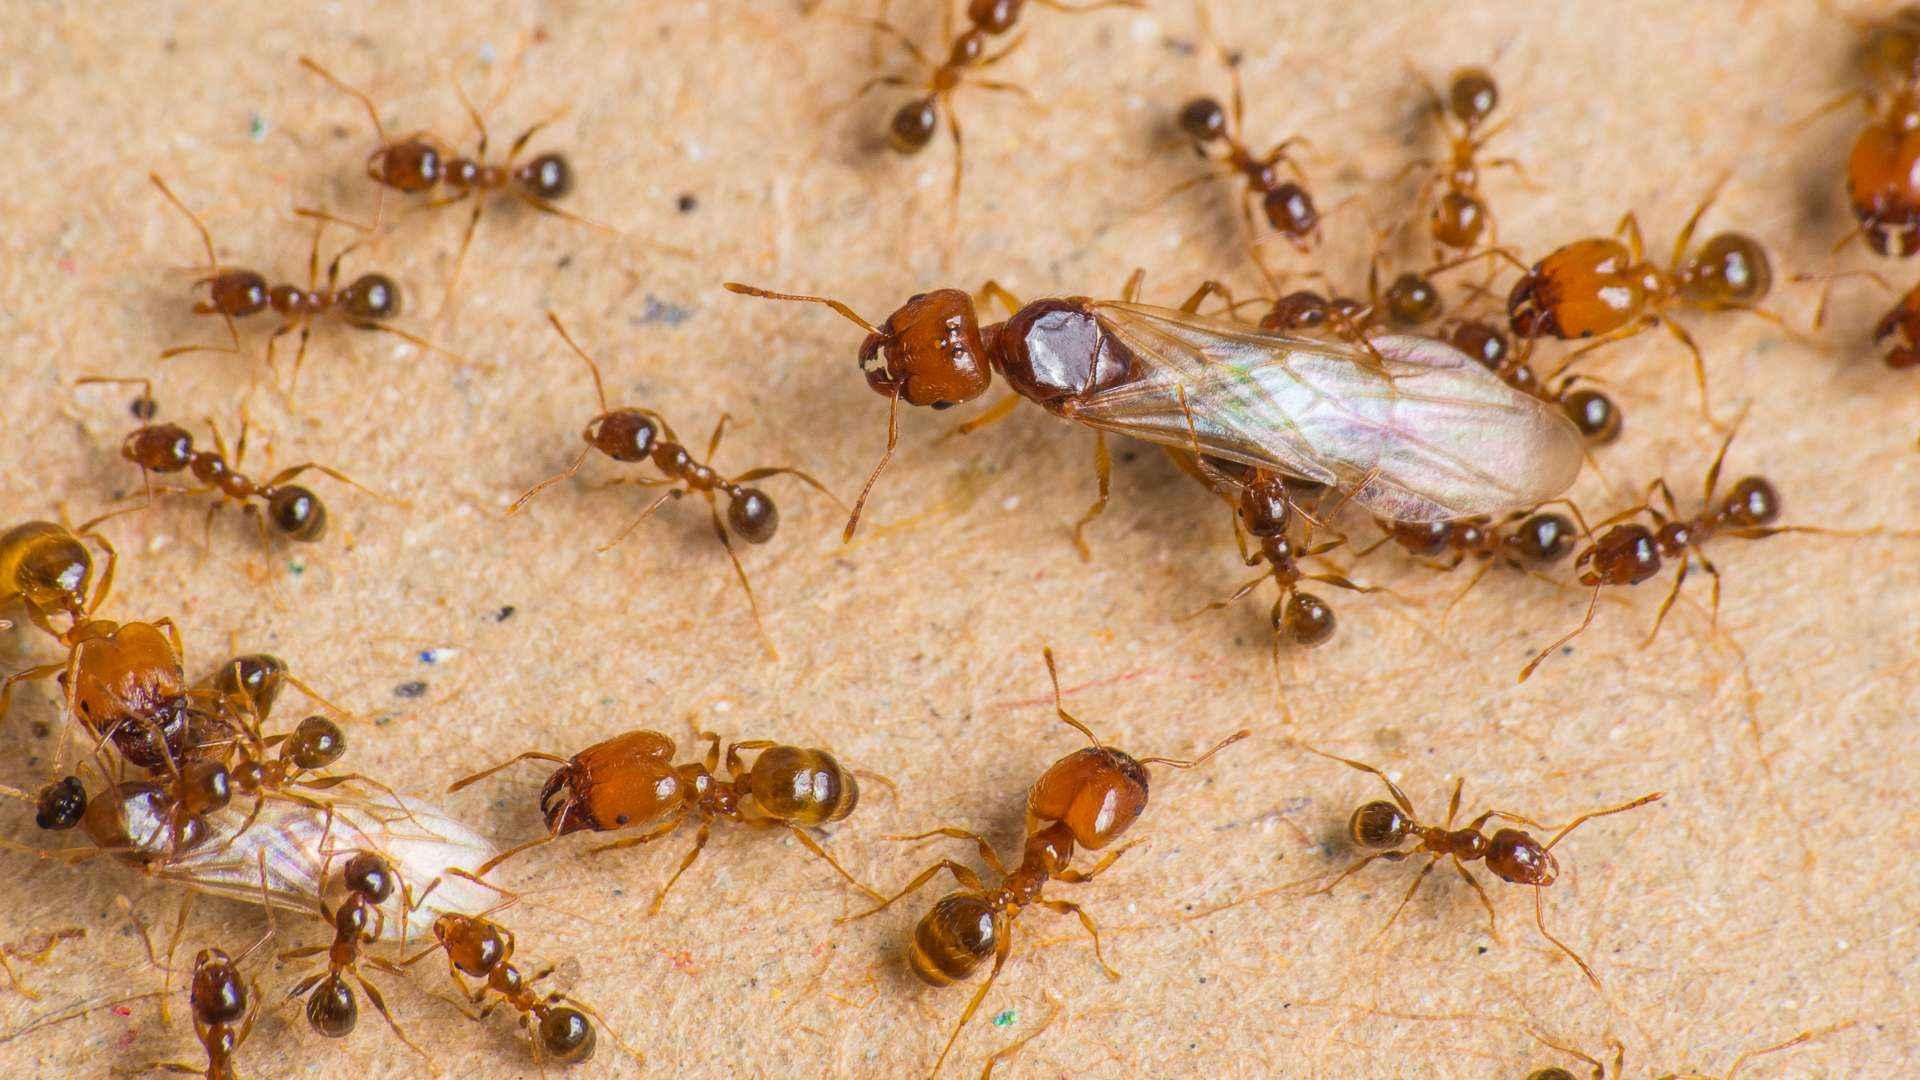 pheidole pallidula erster schwarmflug crazy ants. Black Bedroom Furniture Sets. Home Design Ideas